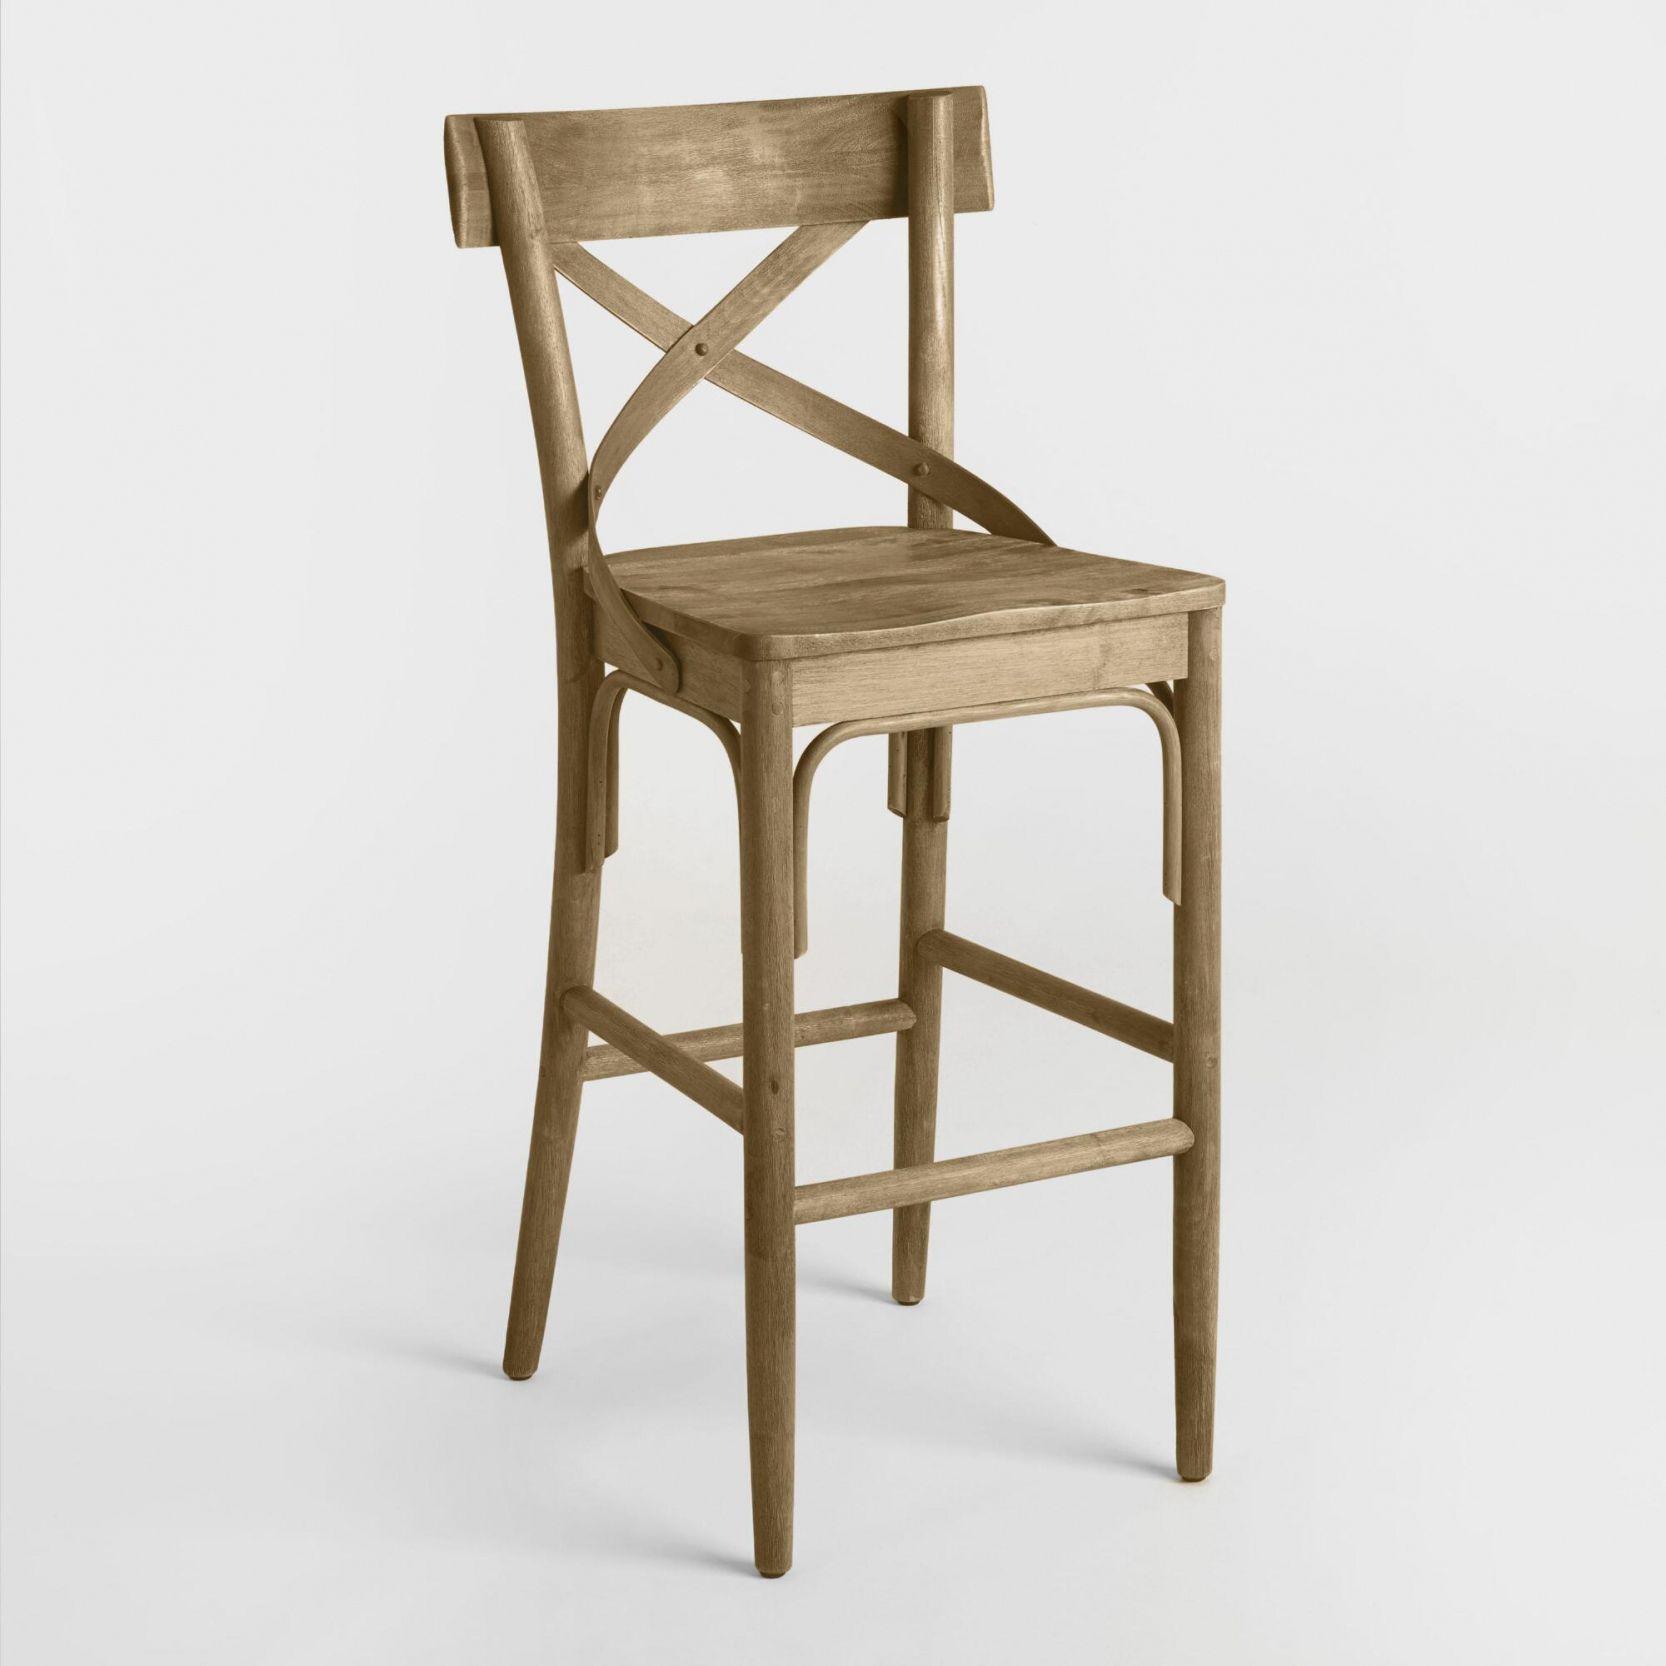 Pin by jooana on evolusion design concept pinterest bar stools